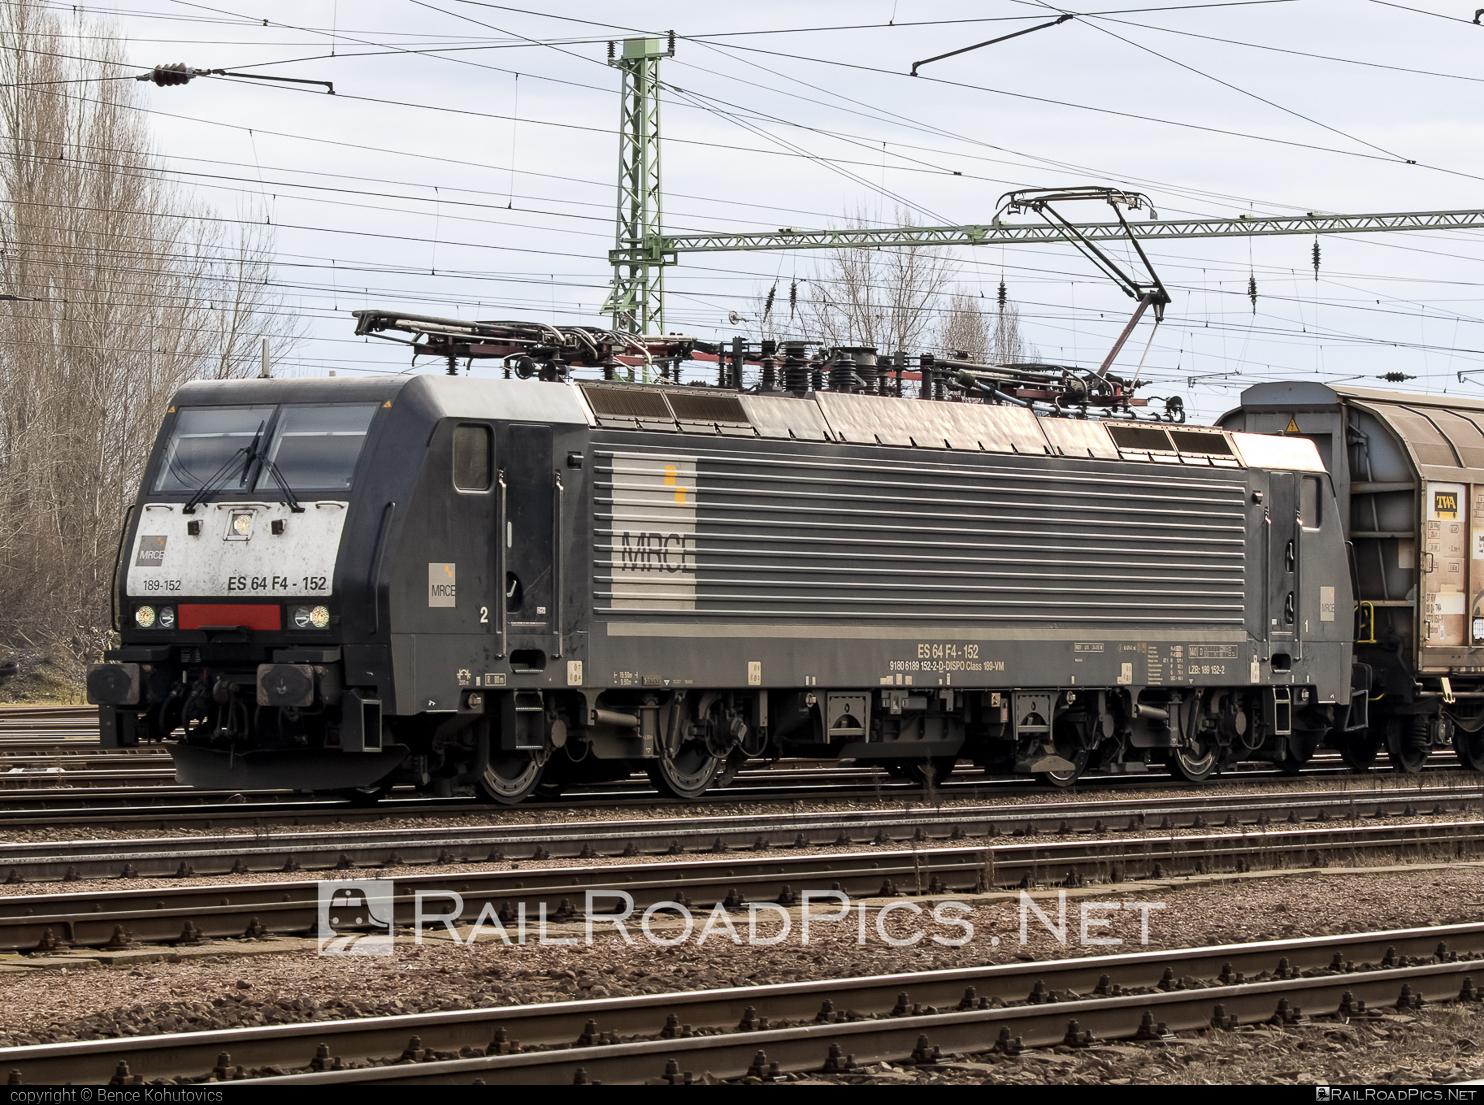 Siemens ES 64 F4 - 189 152-2 operated by Retrack Slovakia s. r. o. #dispolok #es64 #es64f4 #eurosprinter #mitsuirailcapitaleurope #mitsuirailcapitaleuropegmbh #mrce #retrack #retrackslovakia #siemens #siemenses64 #siemenses64f4